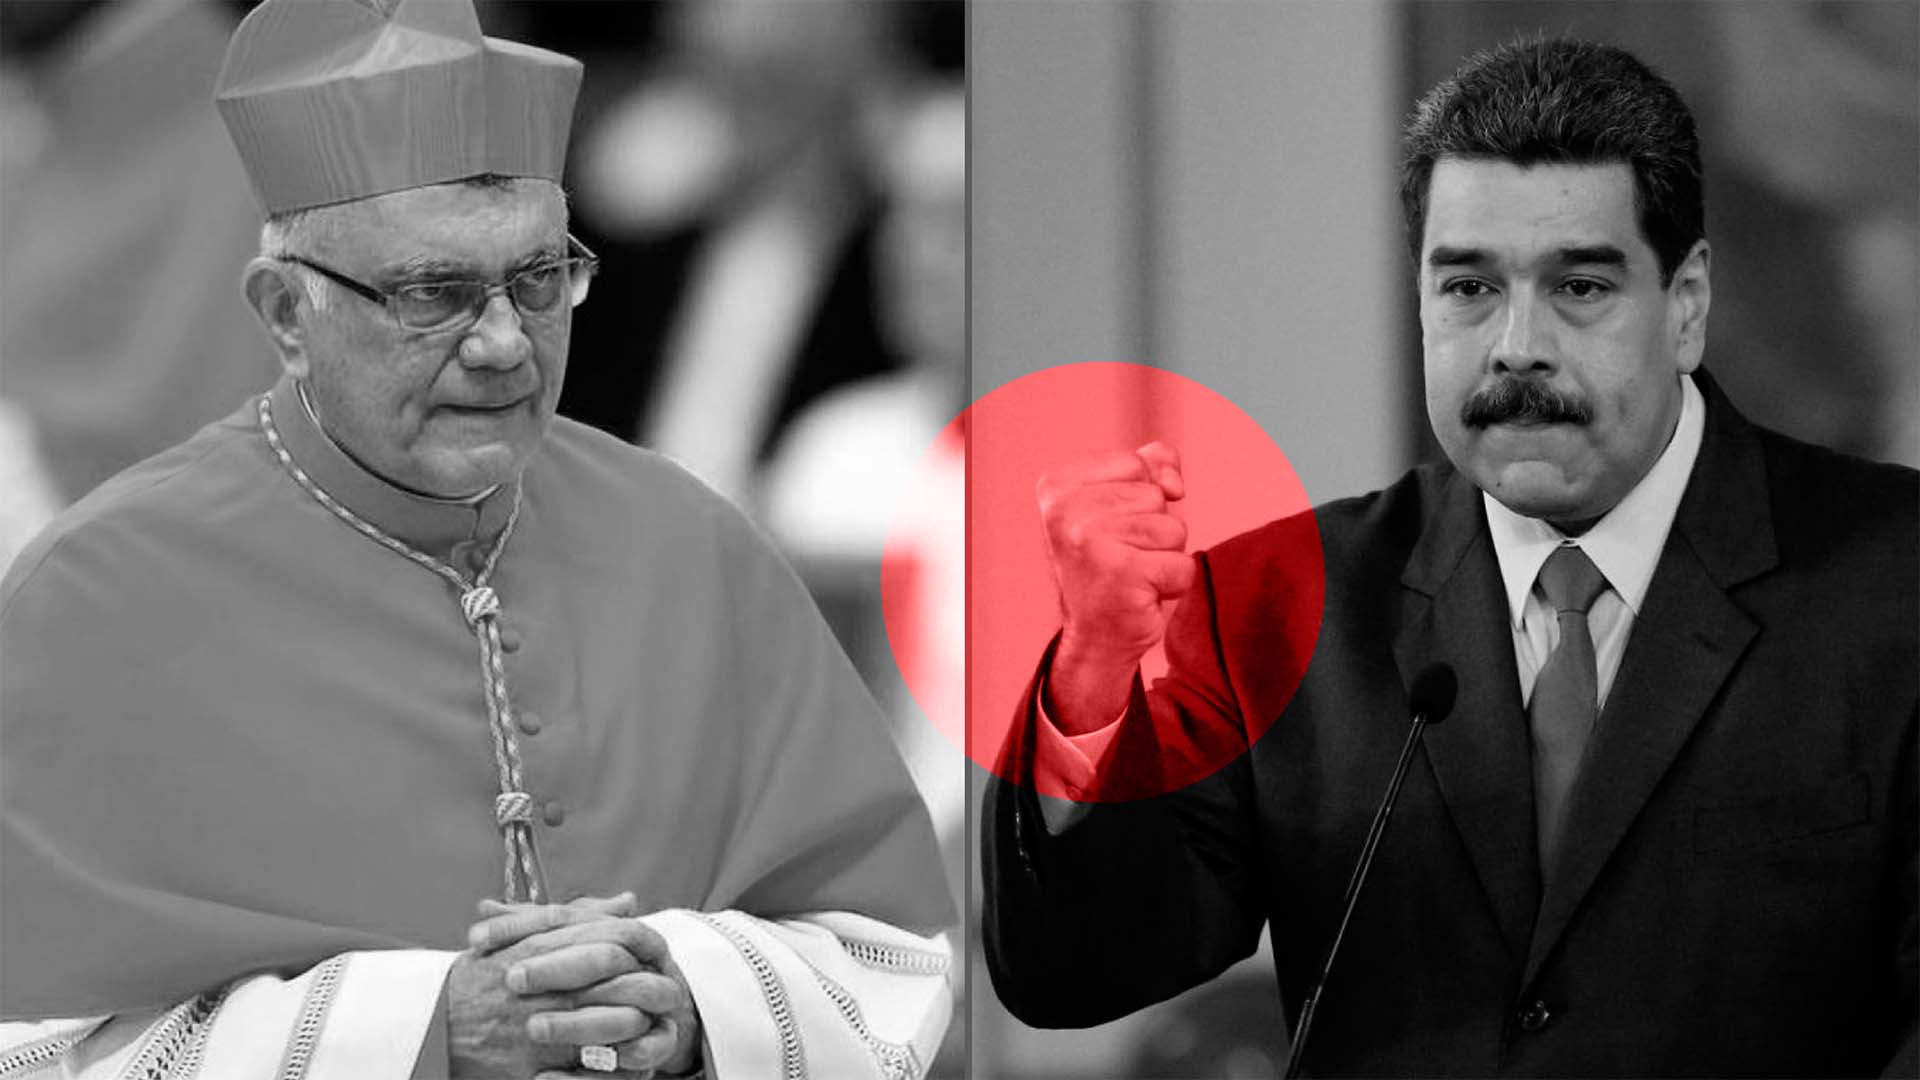 Runrunes de Bocaranda: BAJO – MADURO vs IGLESIA